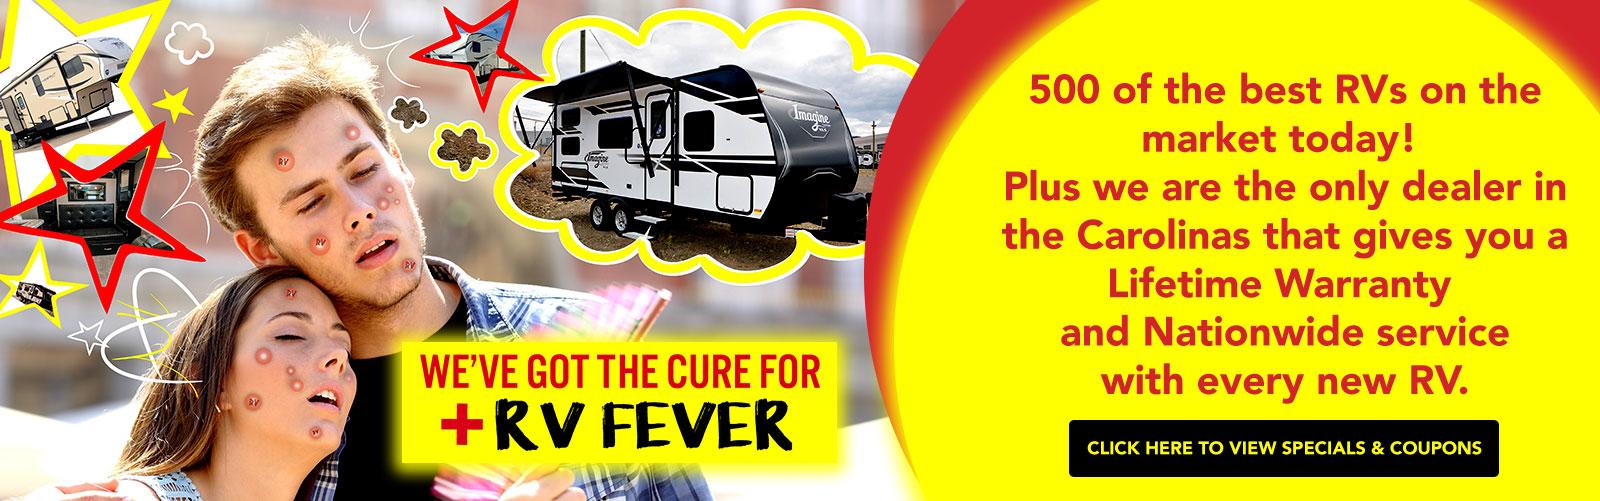 RV Fever